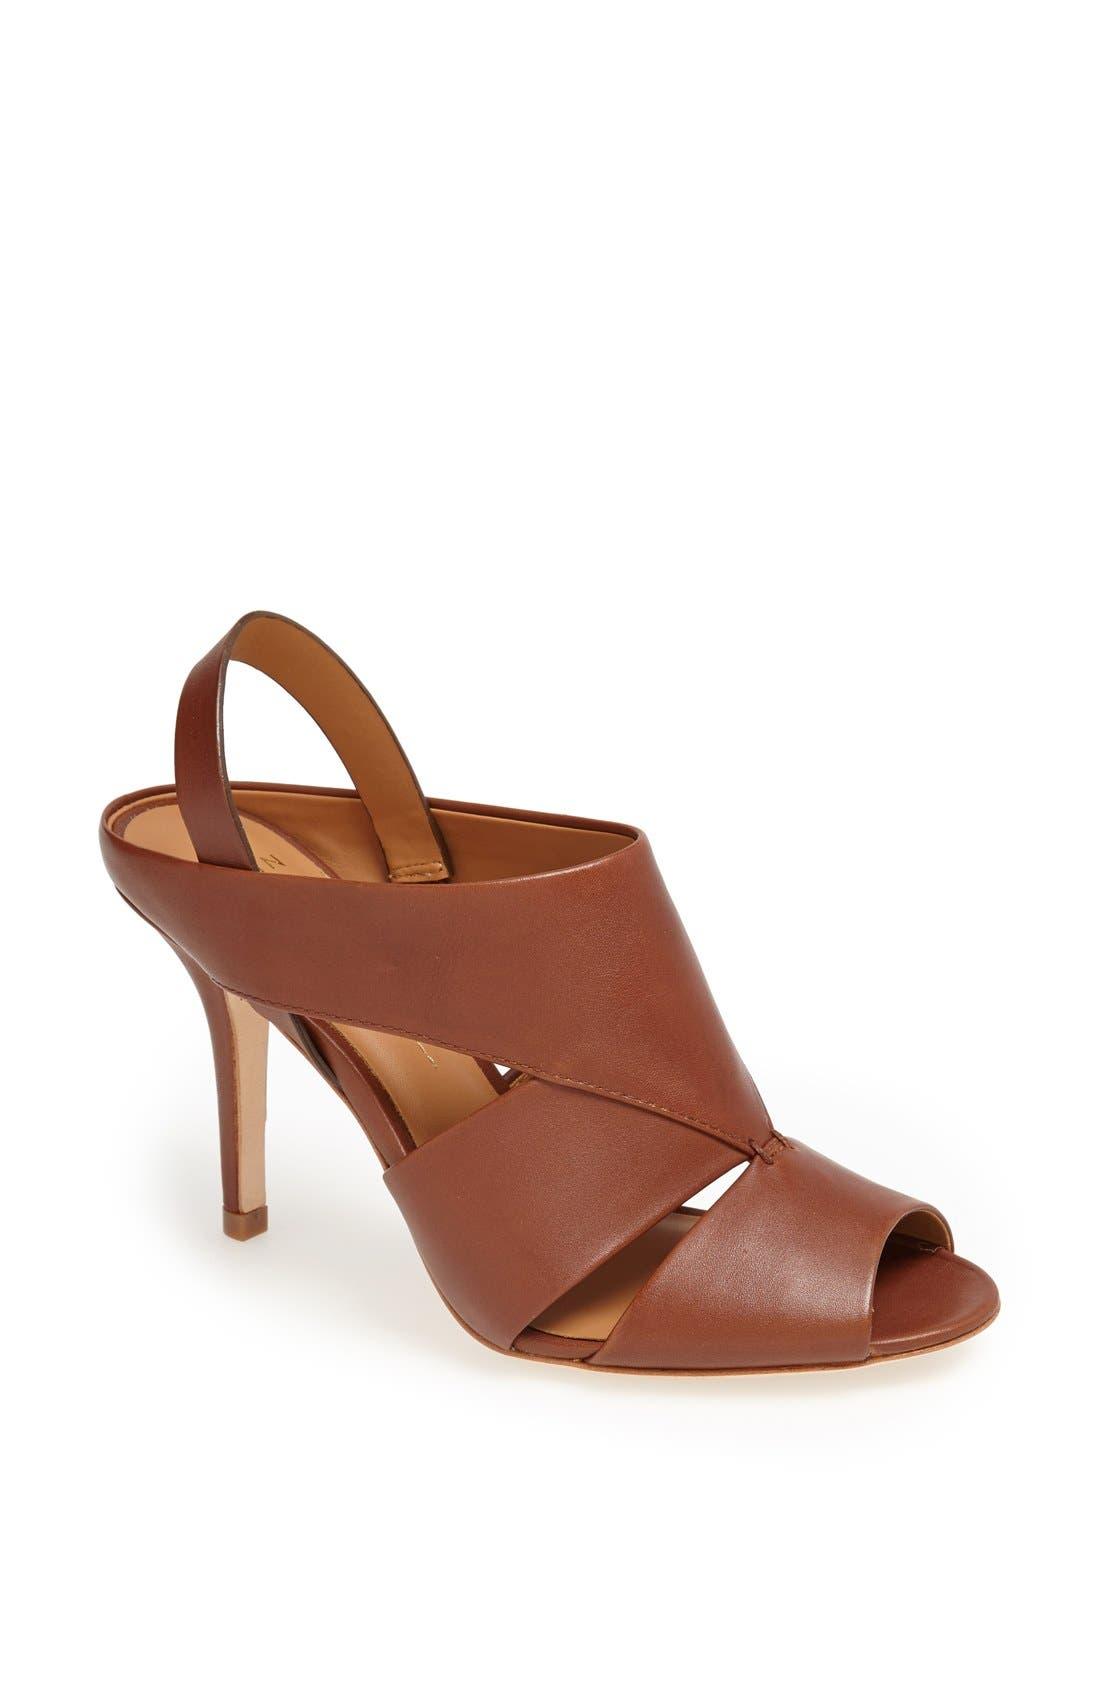 Main Image - Aerin 'Cambel' Slingback Shield Sandal